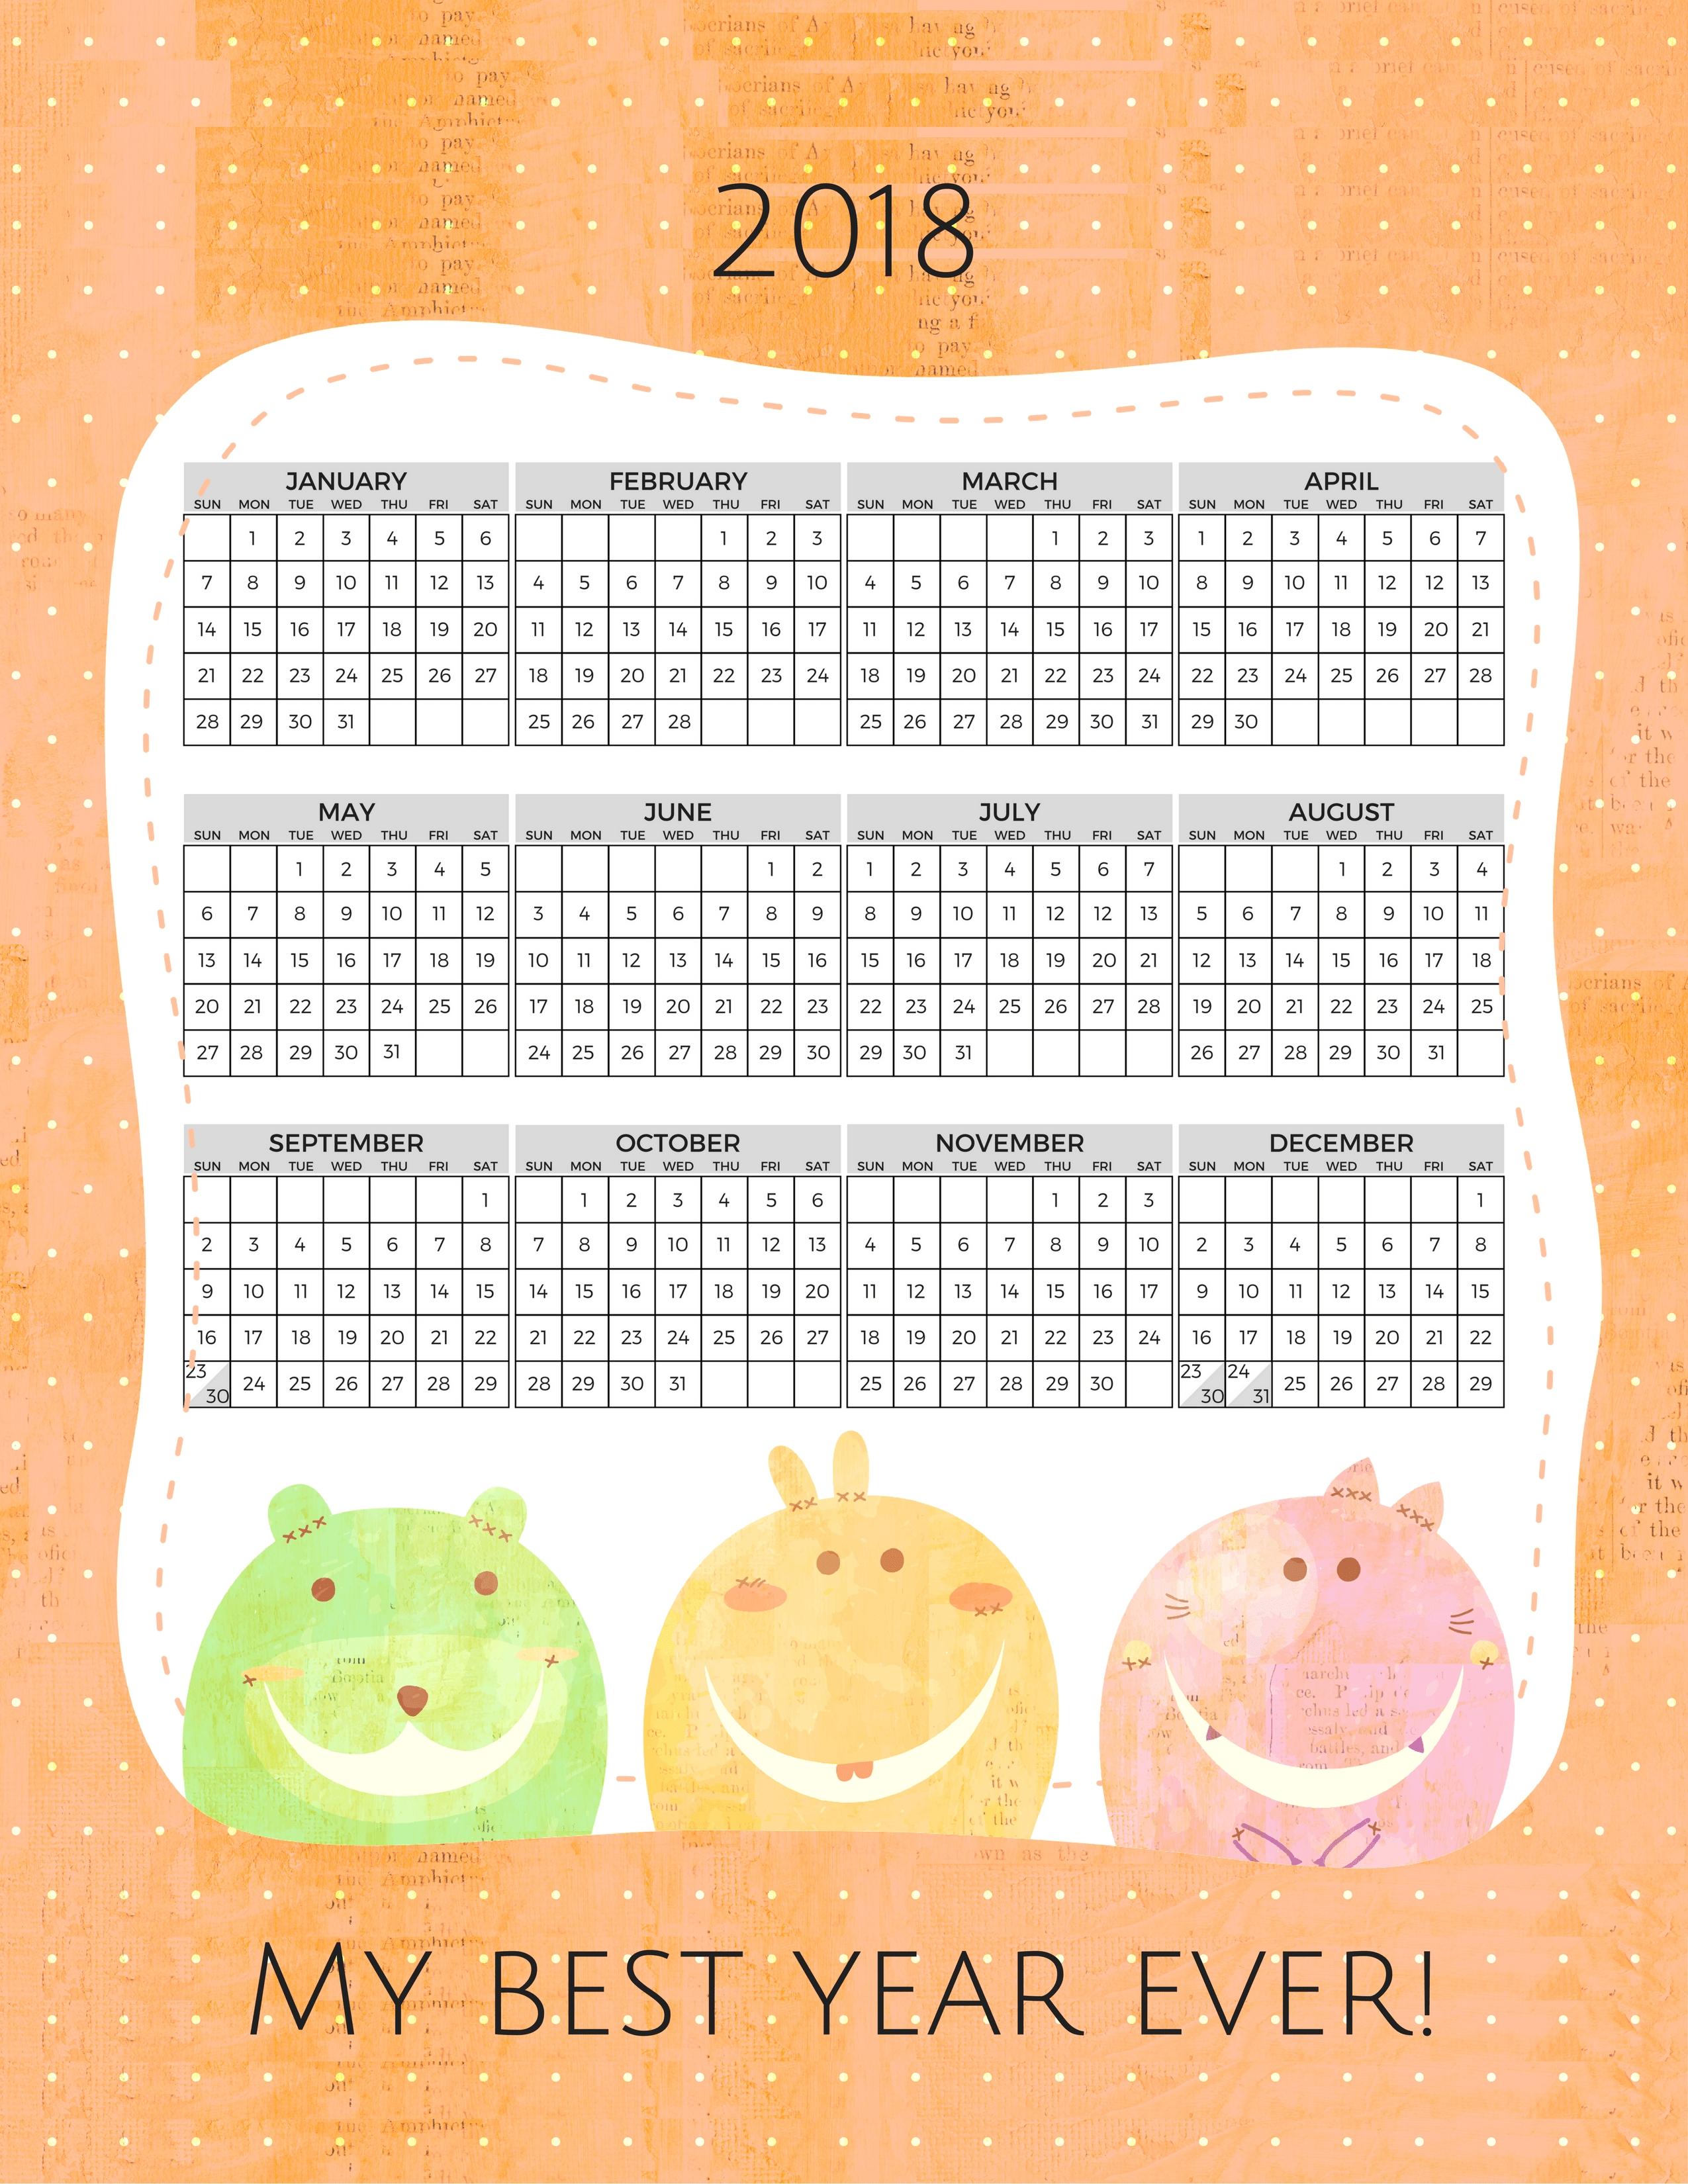 2018 Free Printable Calendar For Kids - Printables And Inspirations